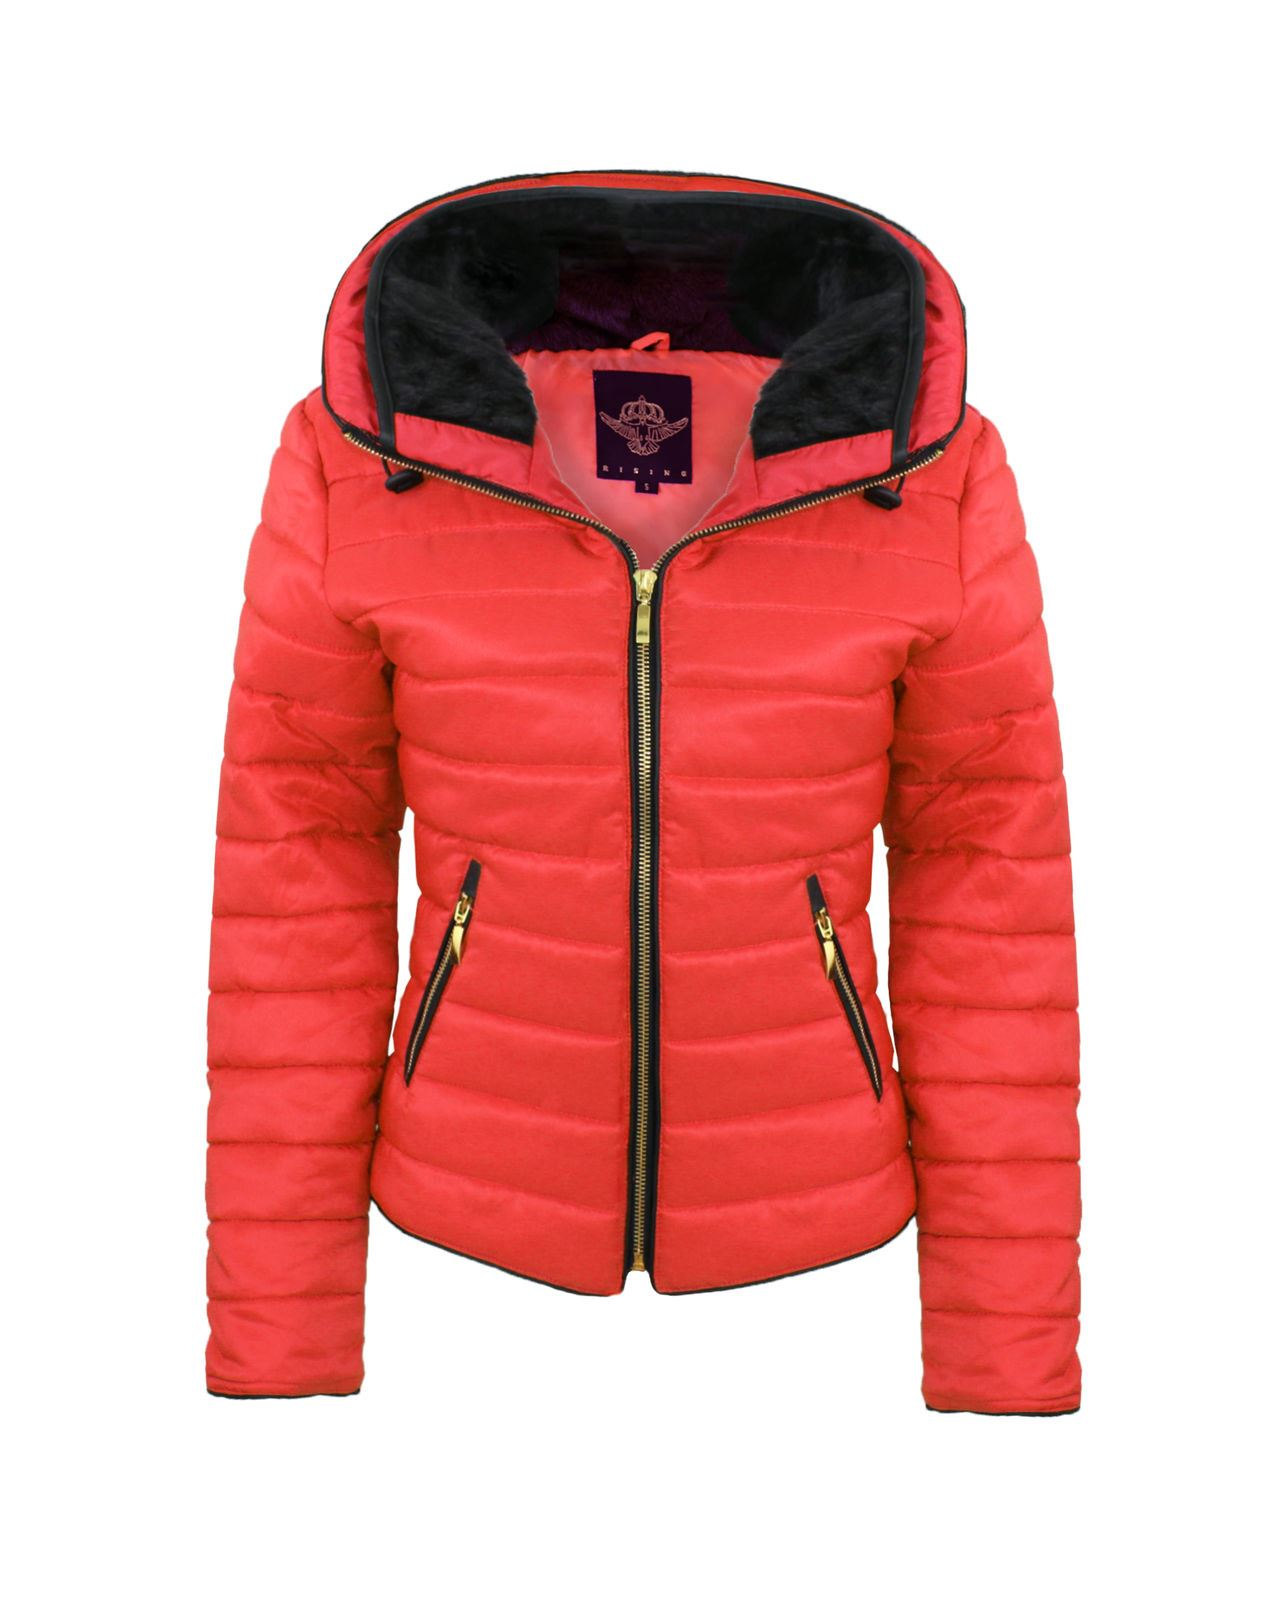 Bubble coat for women